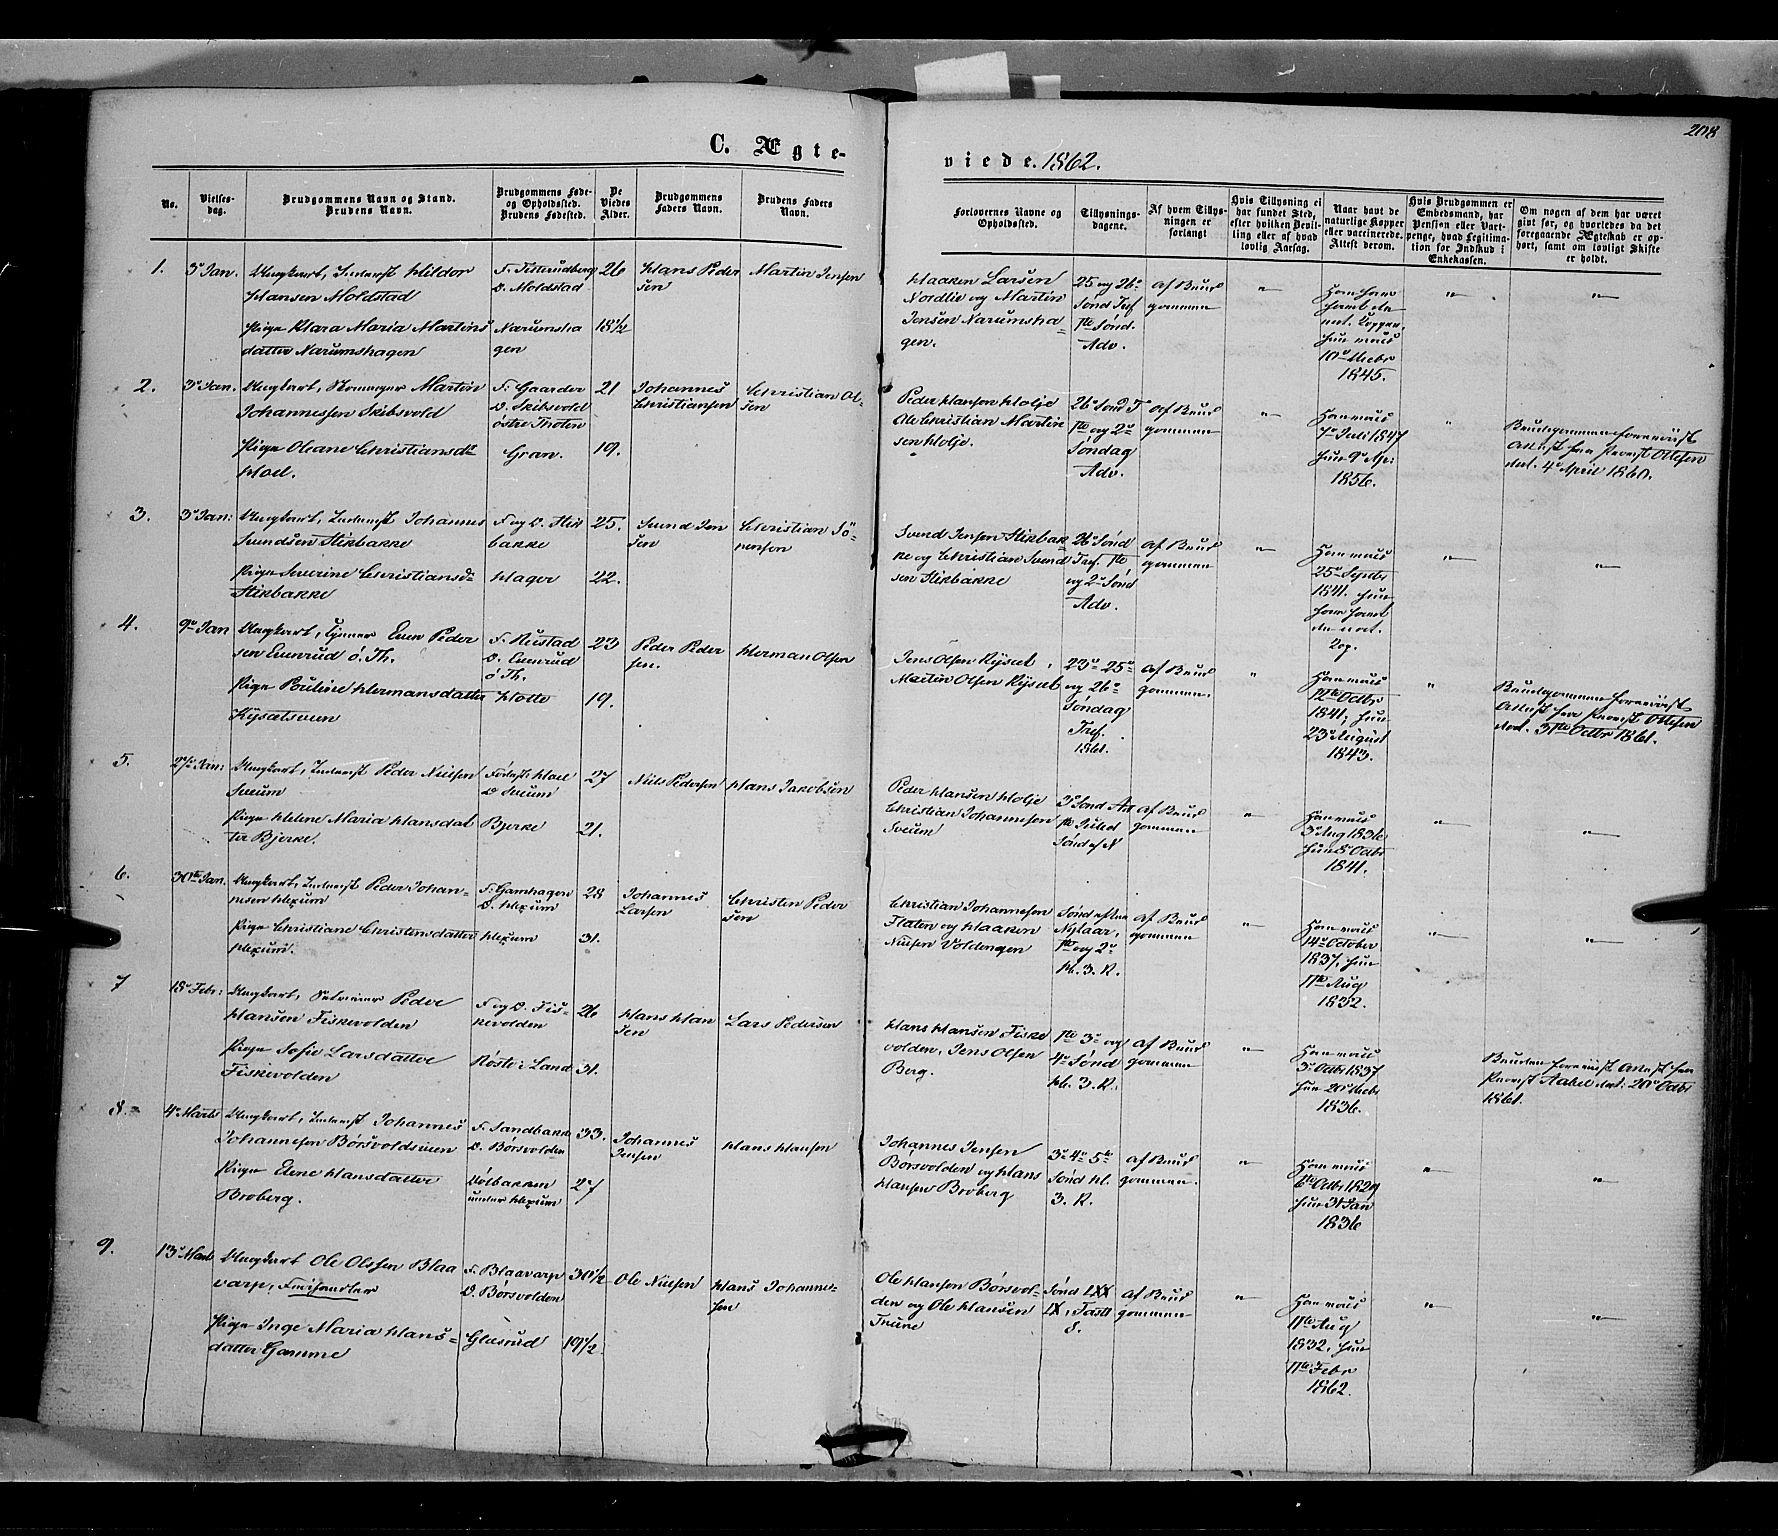 SAH, Vestre Toten prestekontor, H/Ha/Haa/L0007: Ministerialbok nr. 7, 1862-1869, s. 208